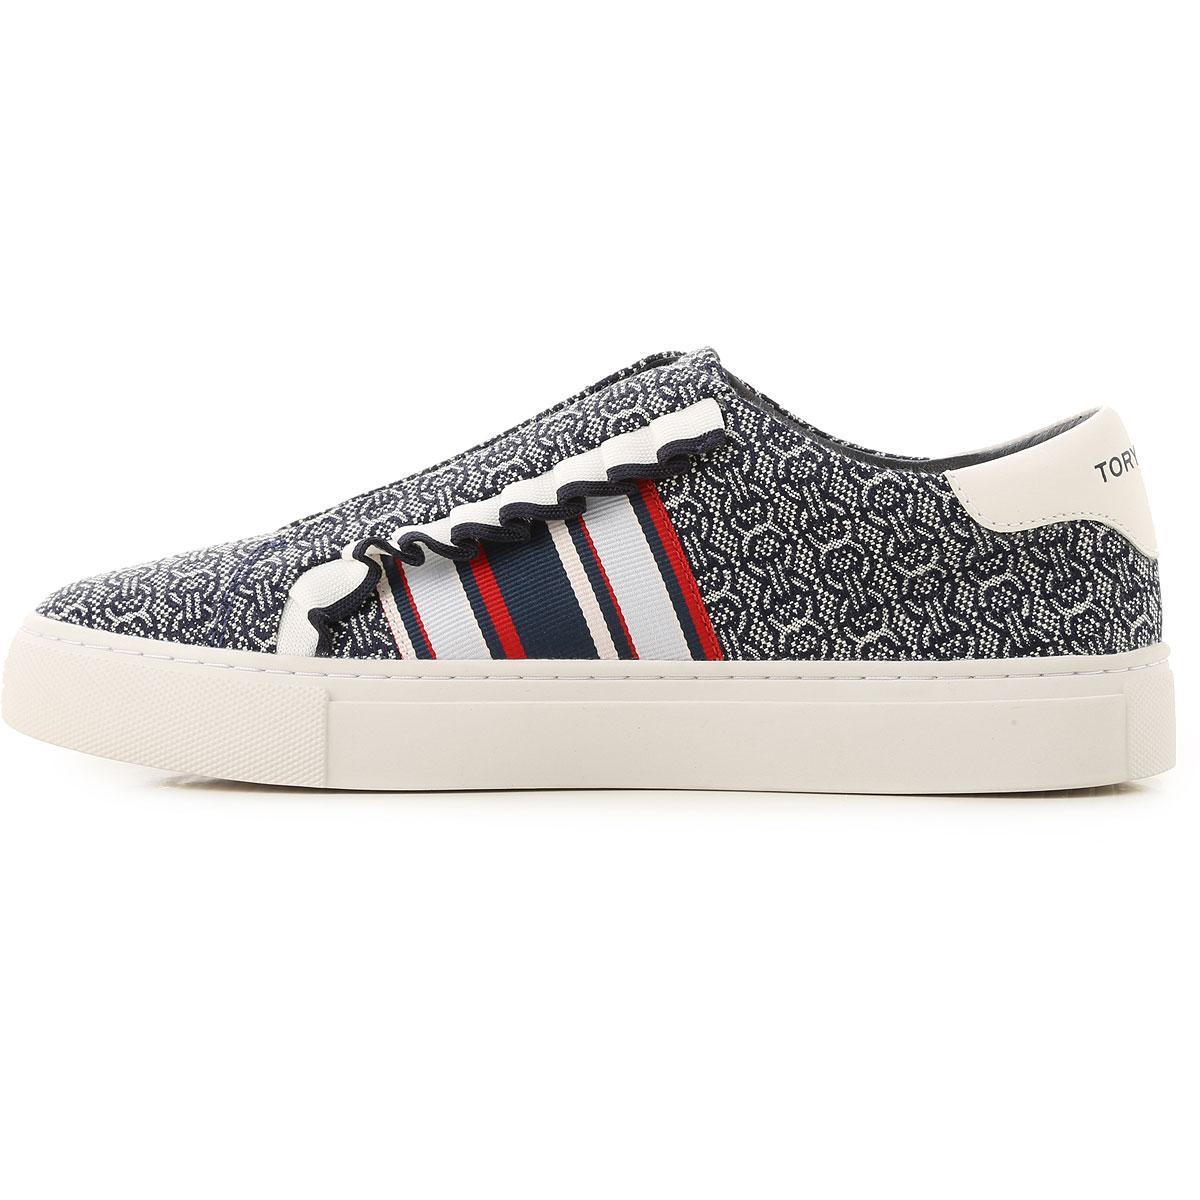 Tory Burch Sneakers For Women On Sale In Blue Lyst